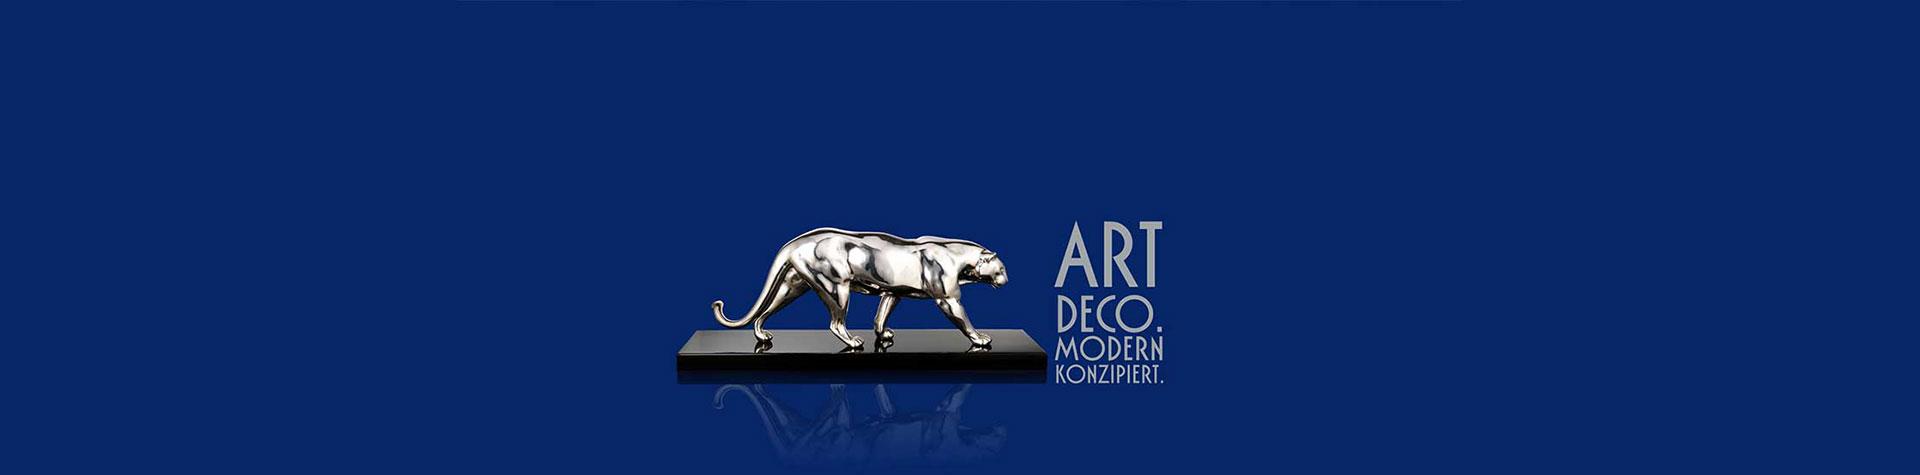 art-deco-blau-panther-breitbild